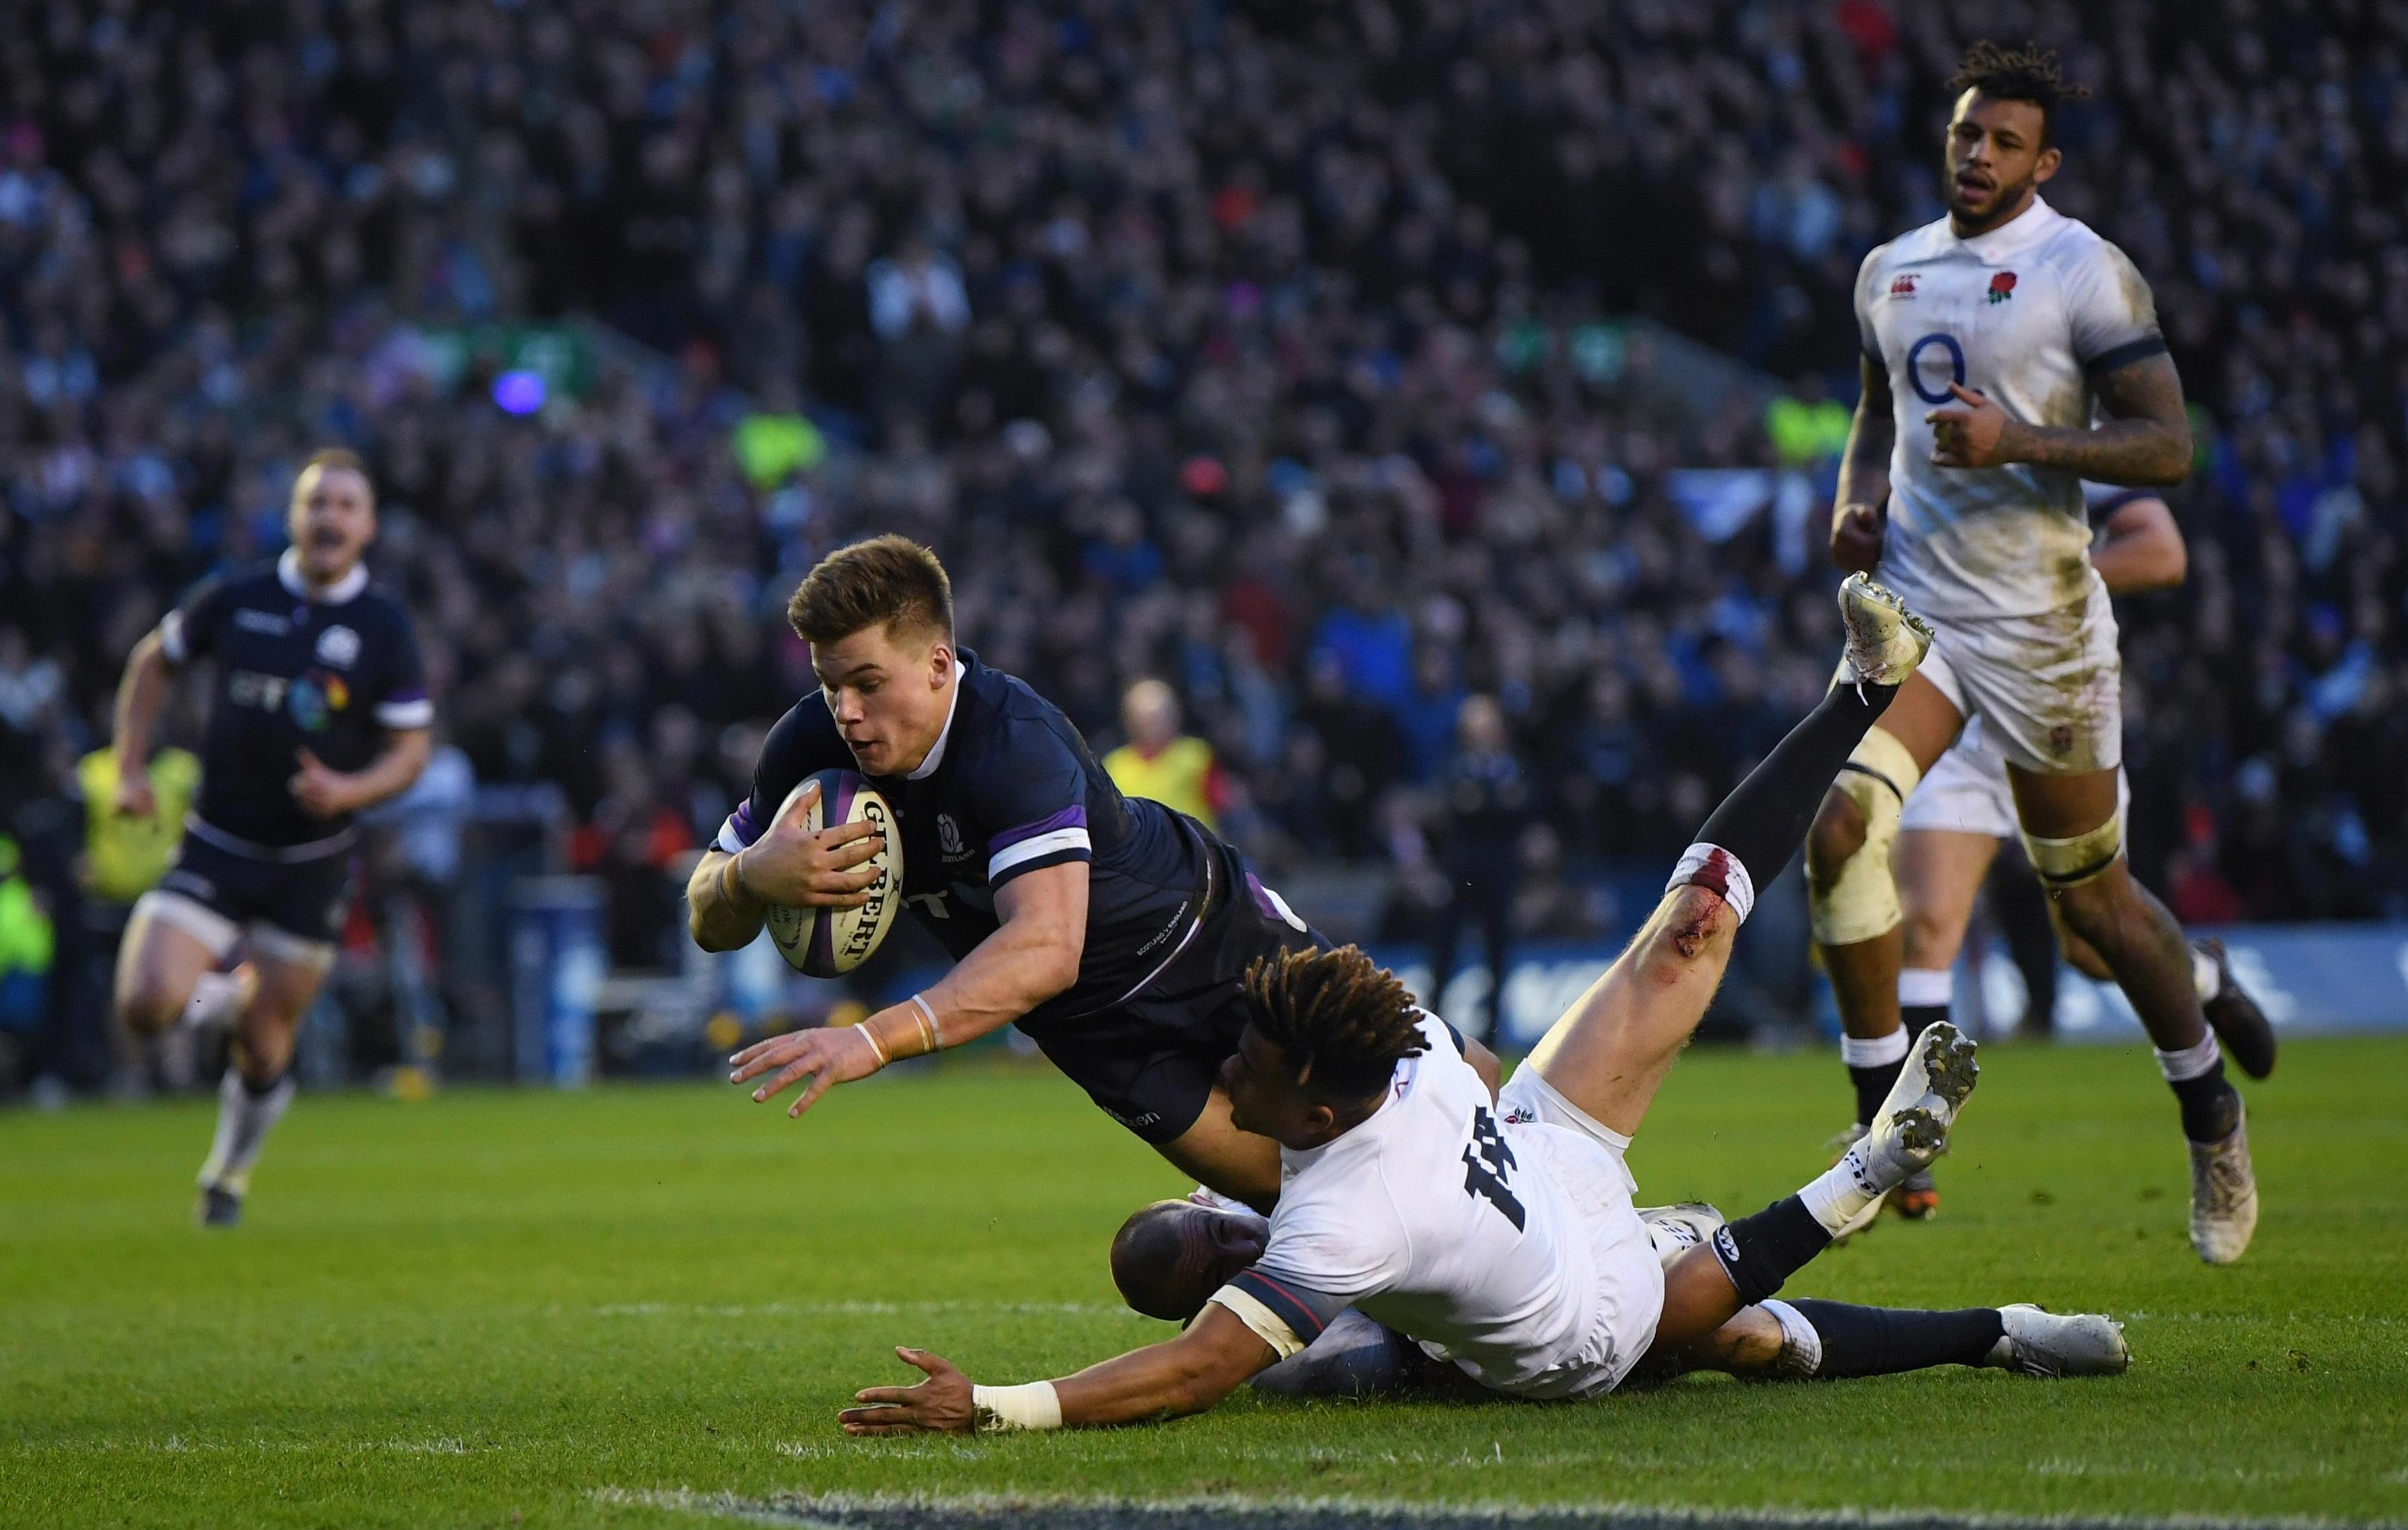 Huw Jones scores Scotlands third try despite the best efforts of Englands Anthony Watson